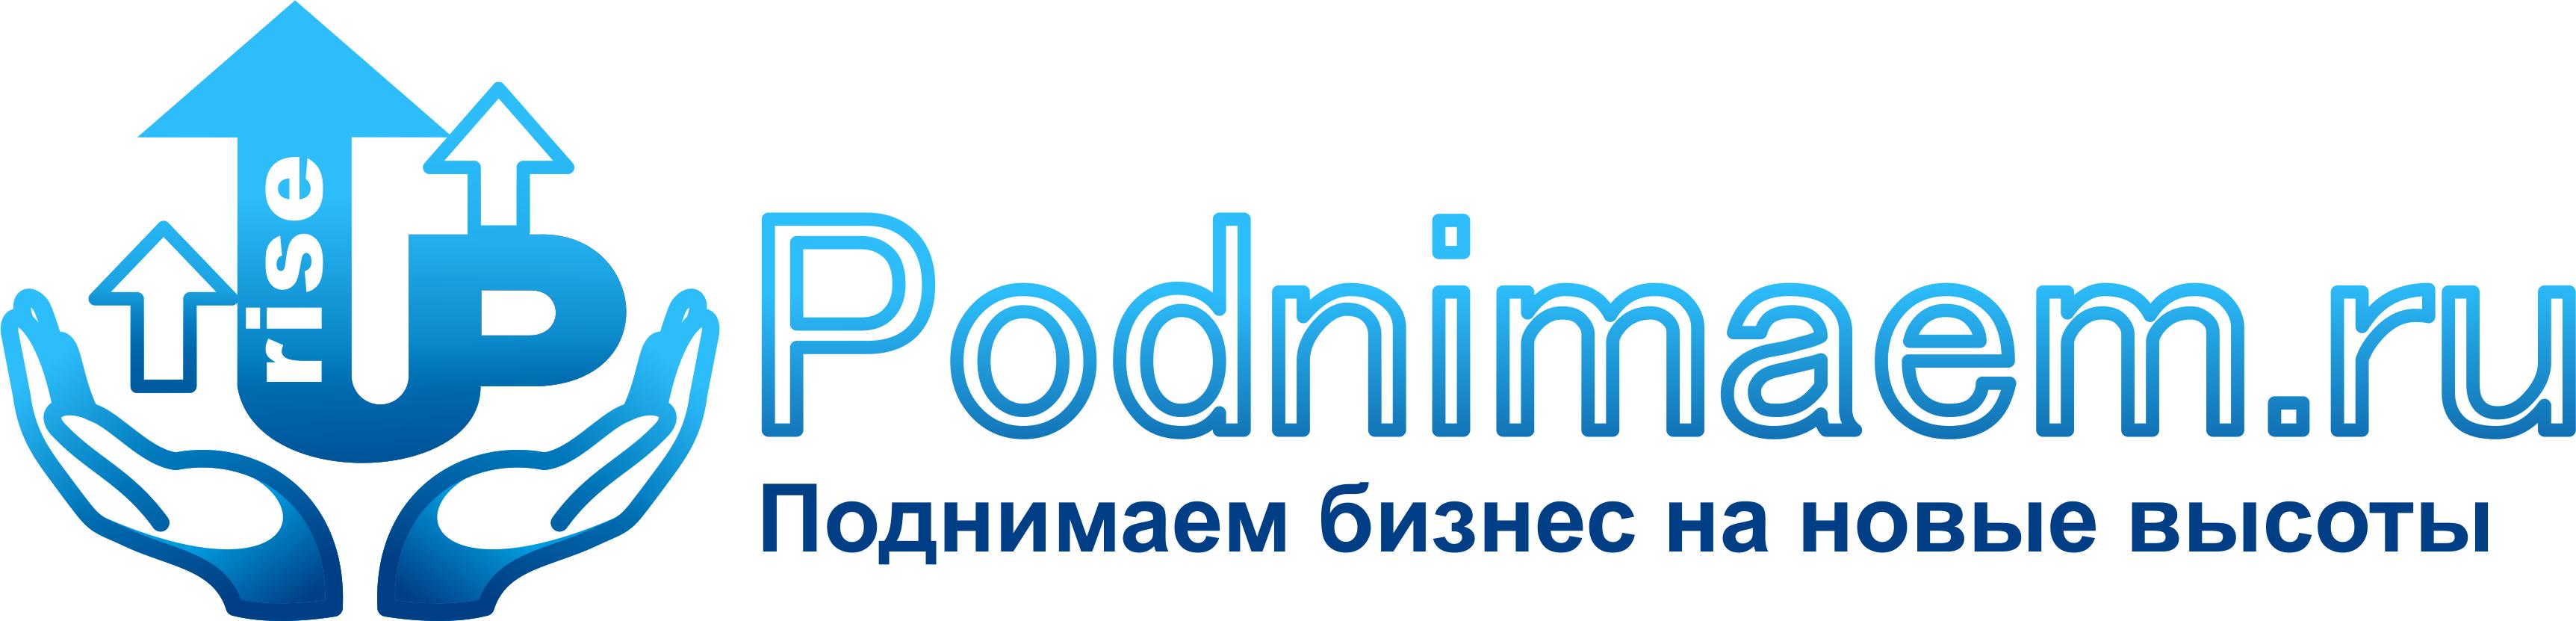 Разработать логотип + визитку + логотип для печати ООО +++ фото f_3675554cff07fcd4.png